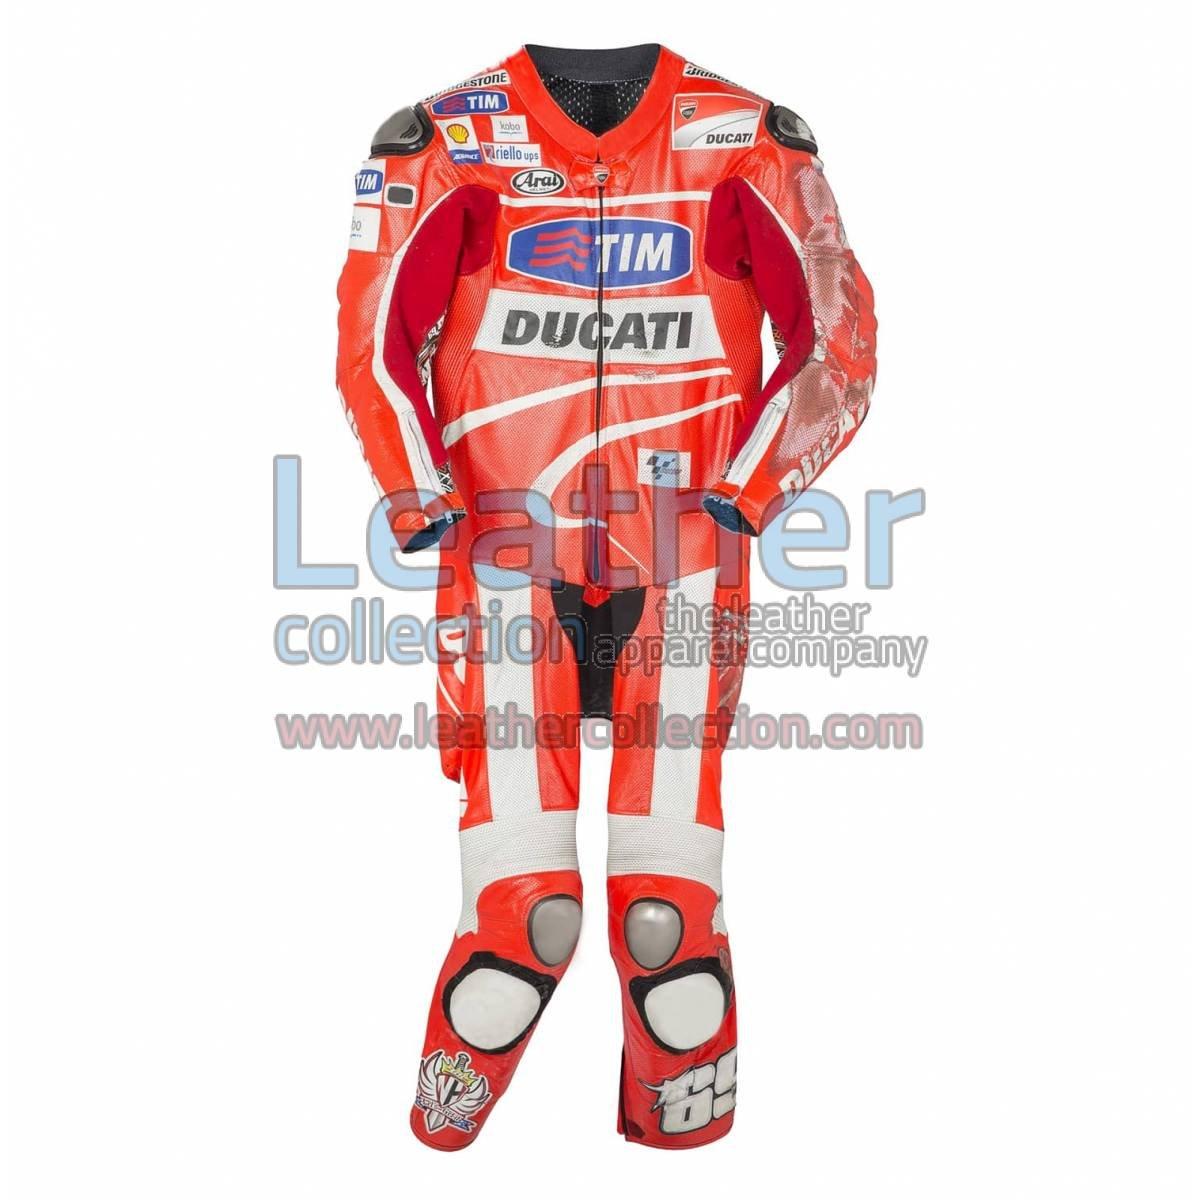 Nicky Hayden 2013 MotoGP Race Leathers